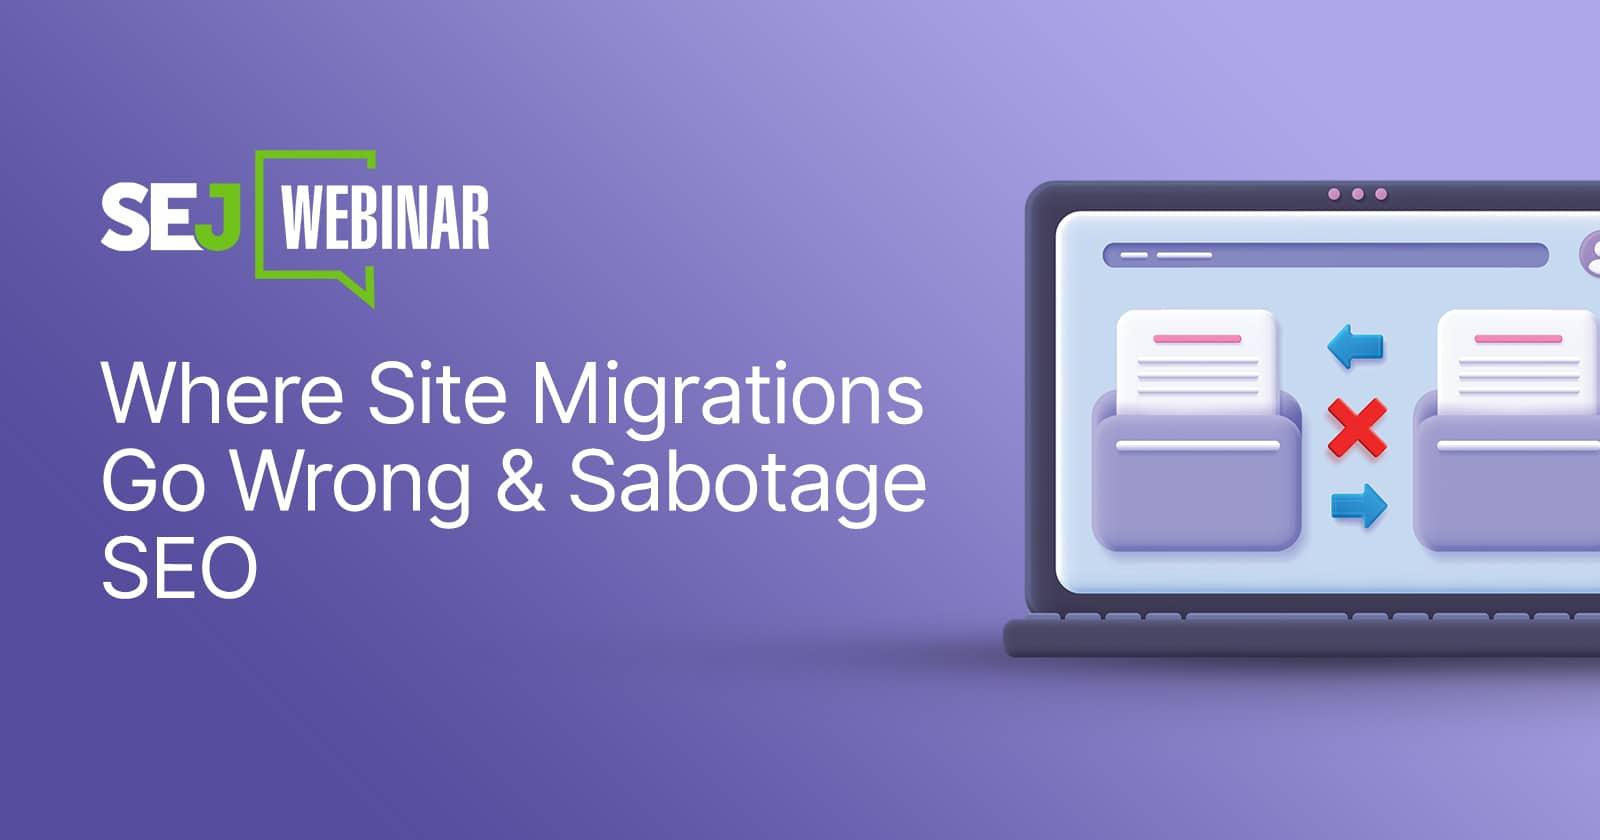 Why & How Site Migrations Go Wrong & Sabotage SEO [Webinar] via @sejournal, @lorenbaker